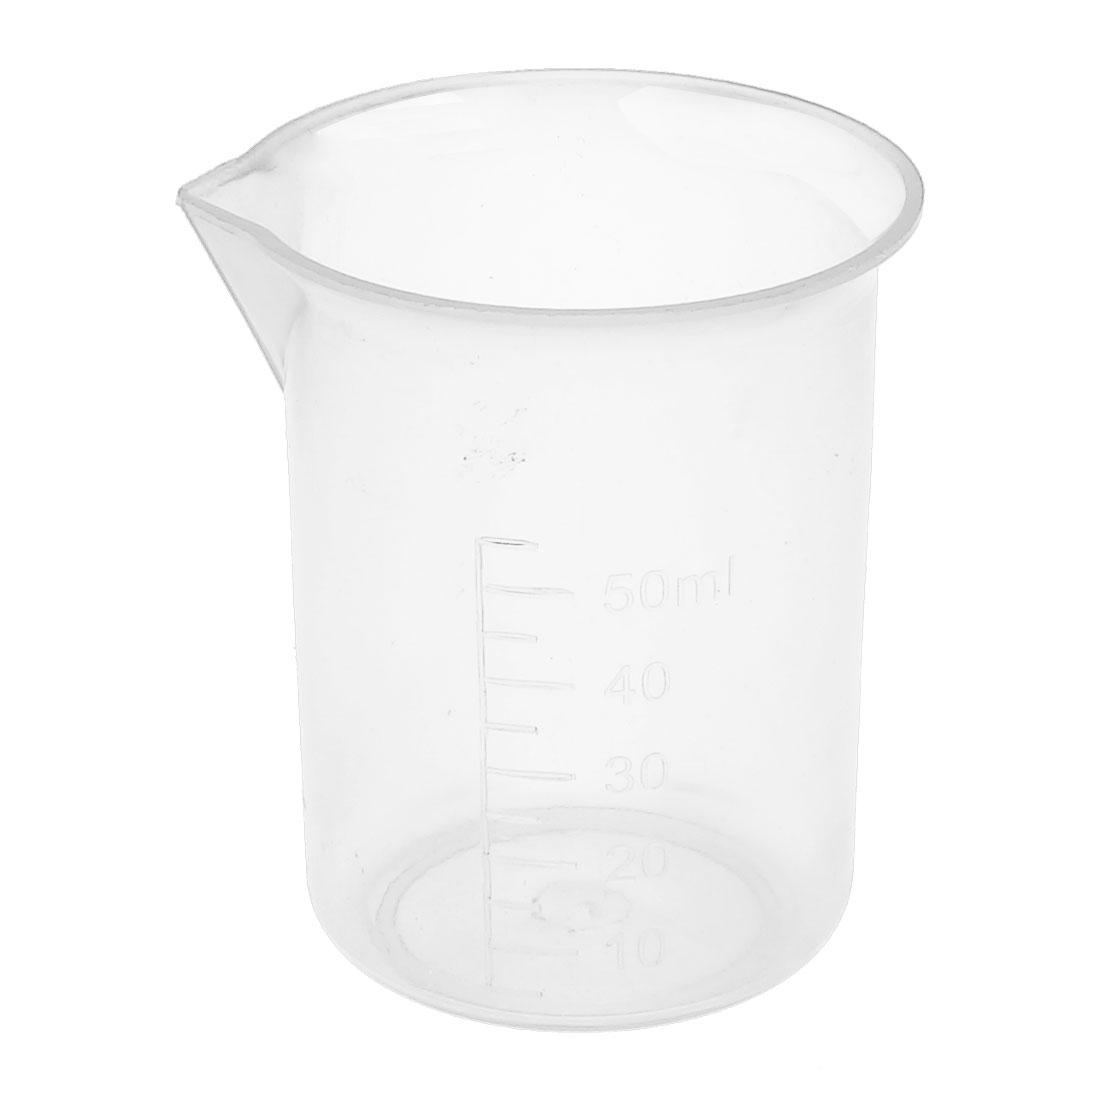 Lab Laboratory Chemistry Graduated Clear Plastic Water Liquid Measuring Container Testing Beaker 50mL